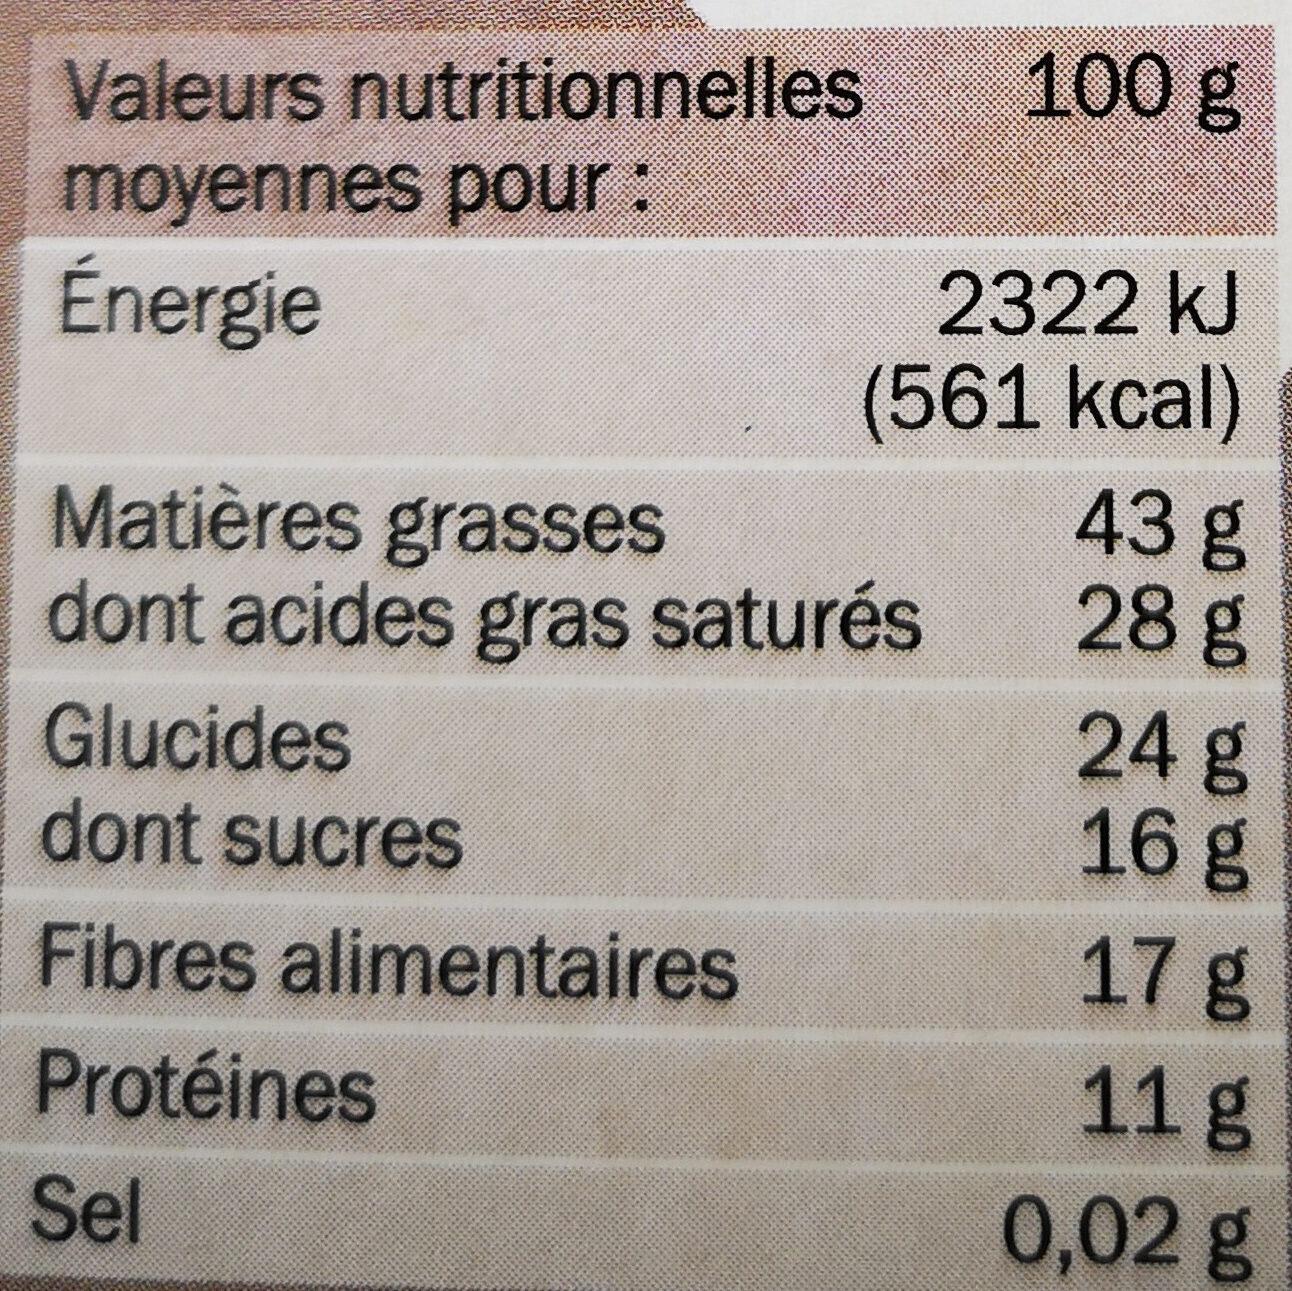 Chocolat noir 85% cacao - Informations nutritionnelles - fr